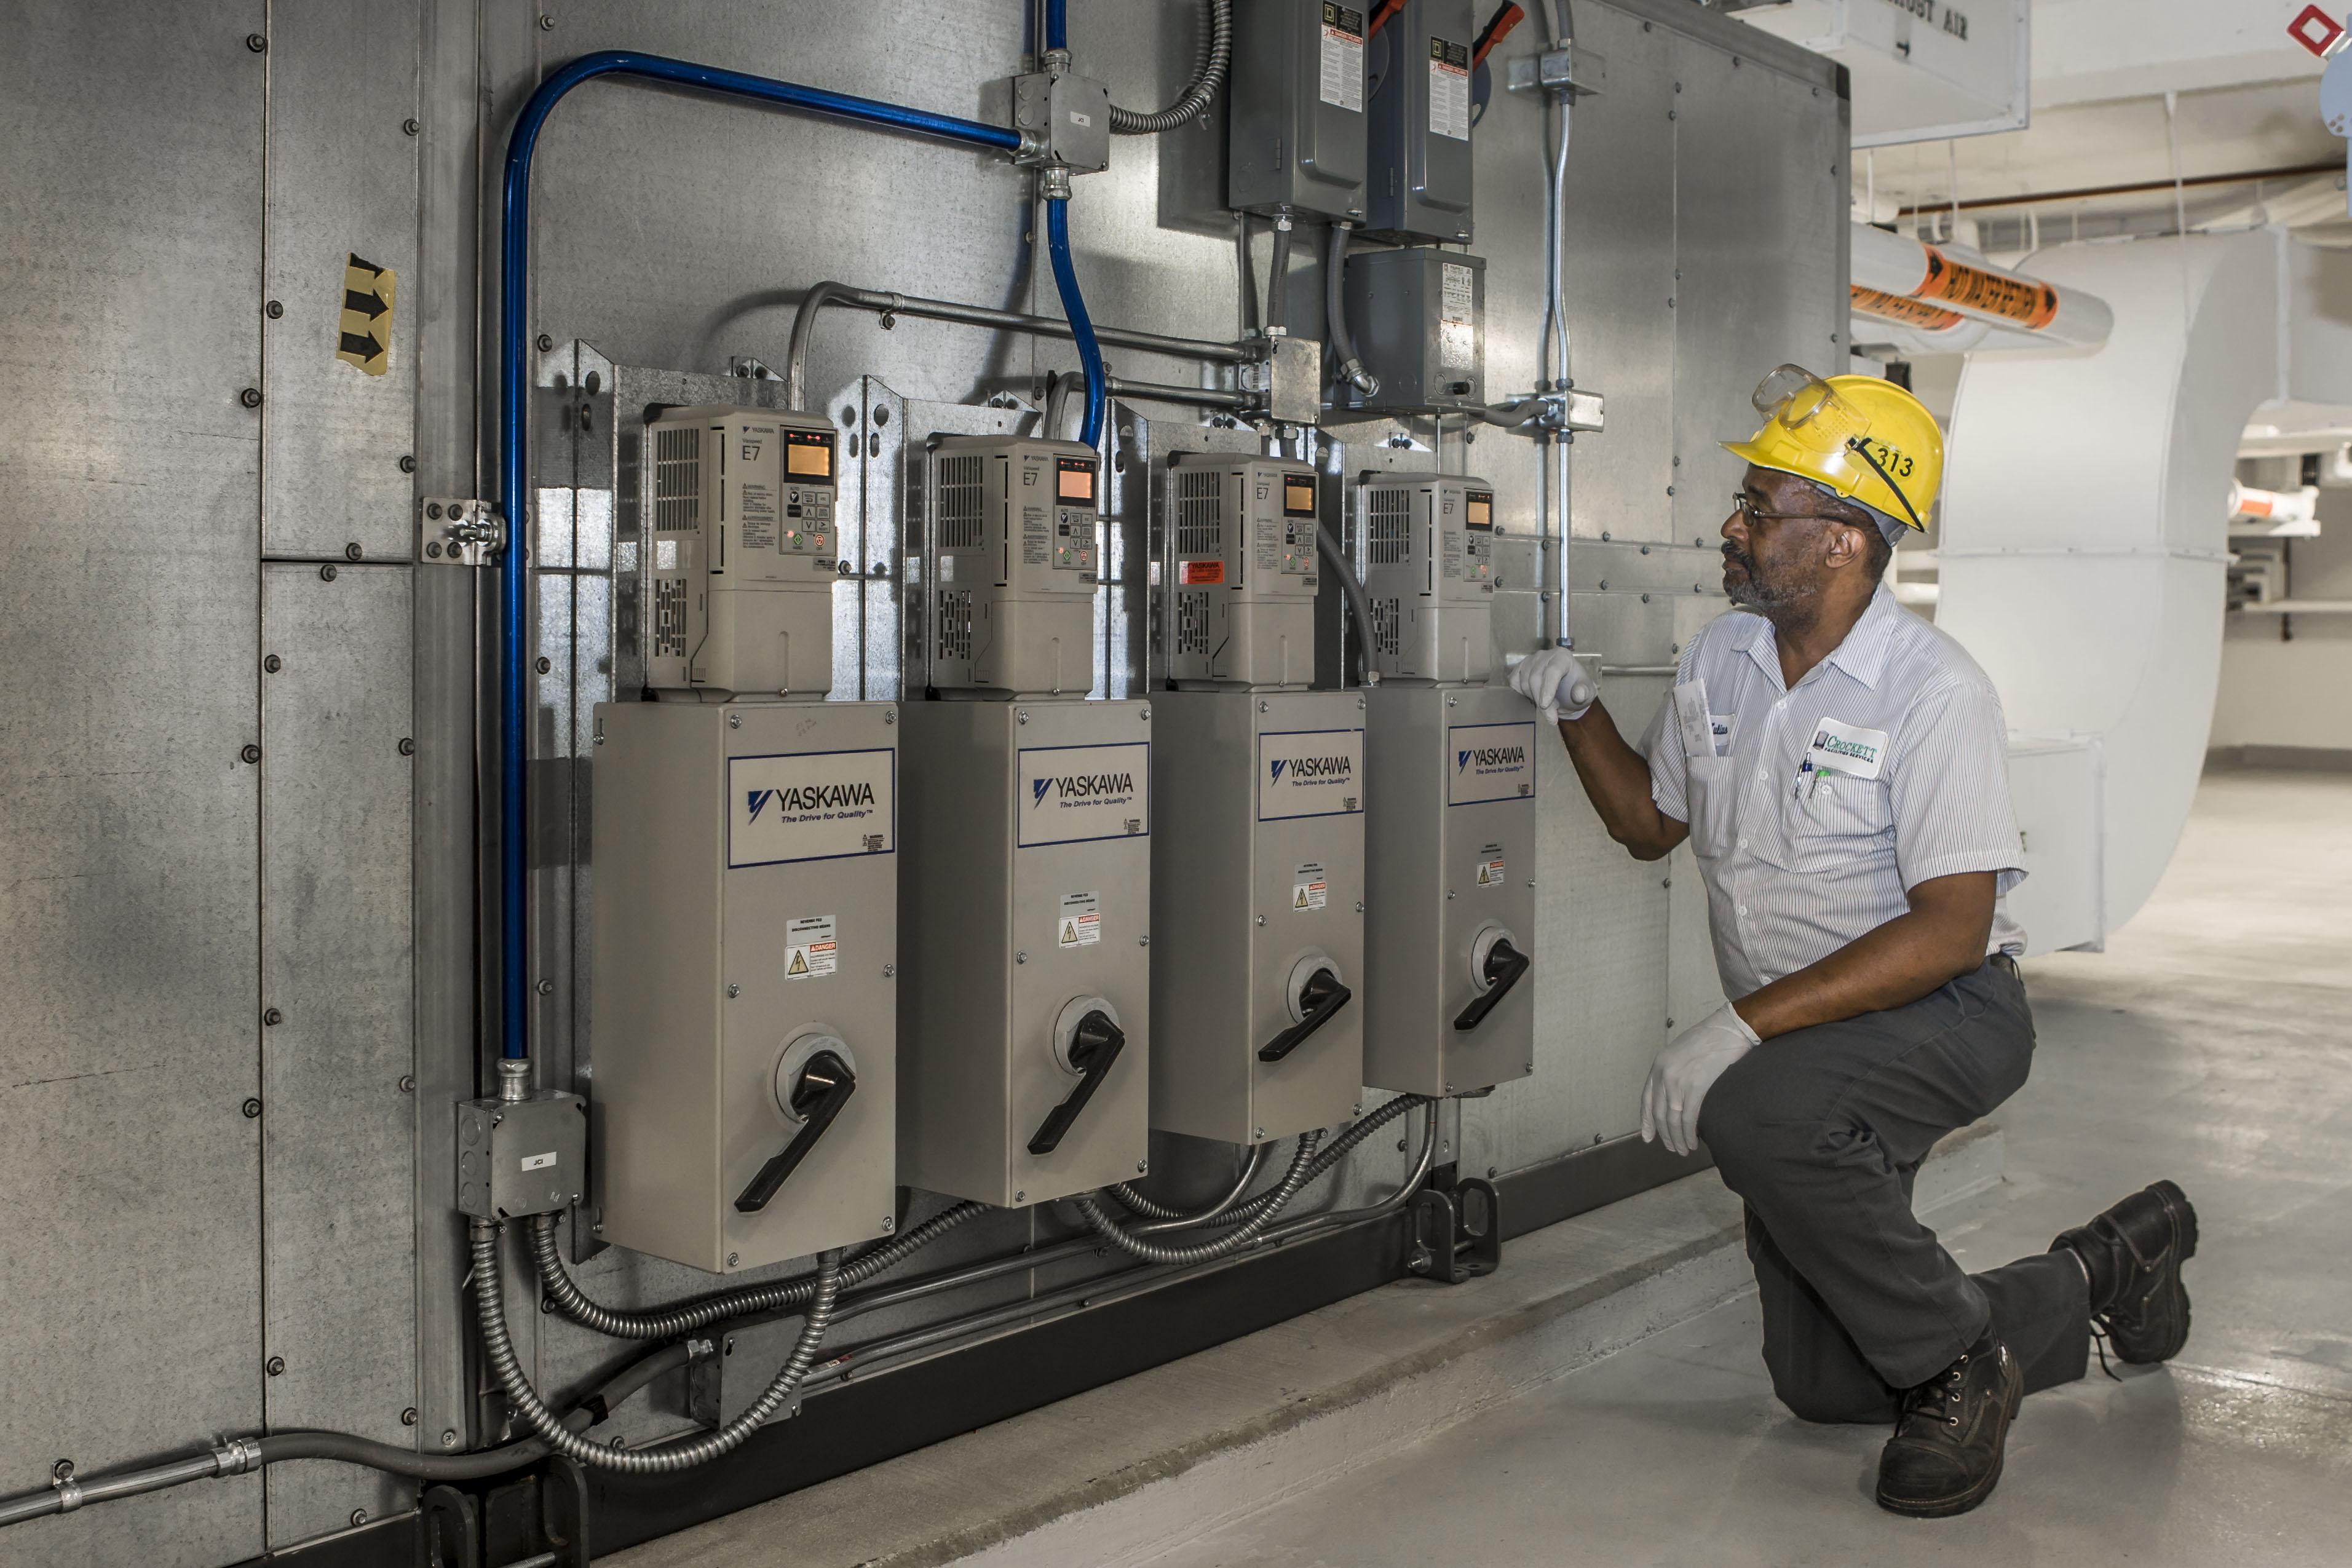 Industrial-vfd-installation-services